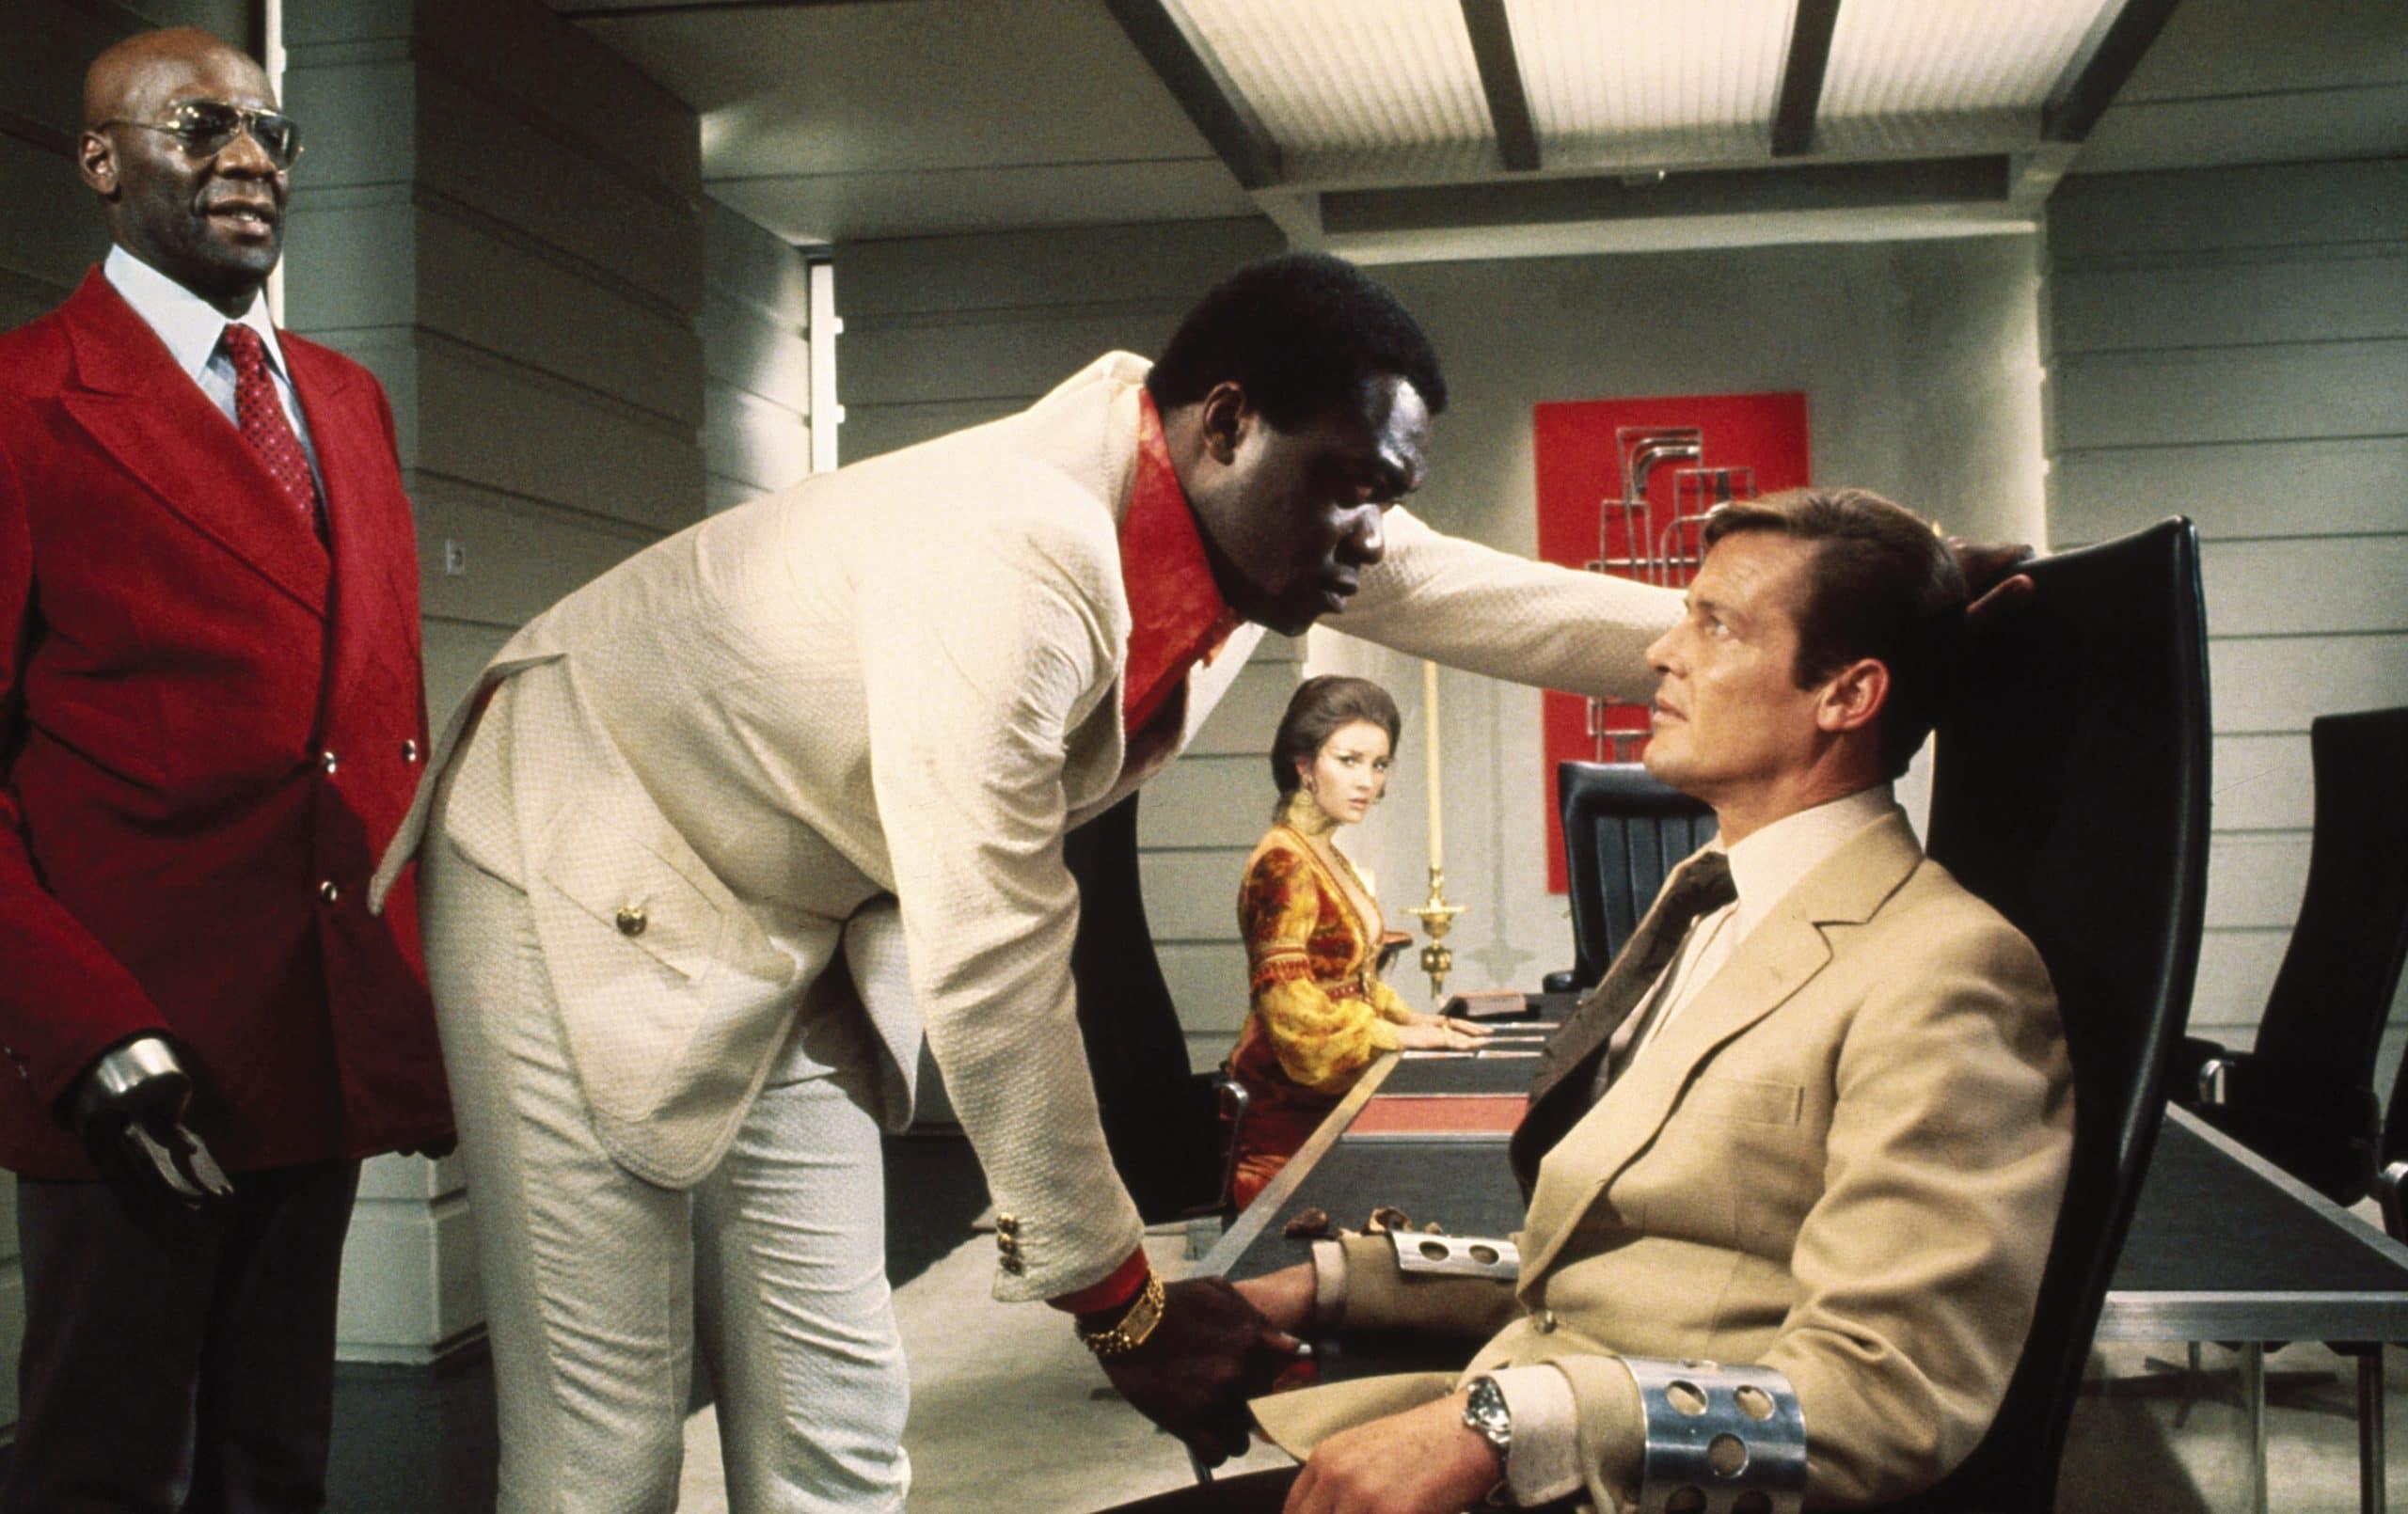 LIVE AND LET DIE, Julius Harris, Yaphet Kotto, Jane Seymour, Roger Moore, 1973 james bond